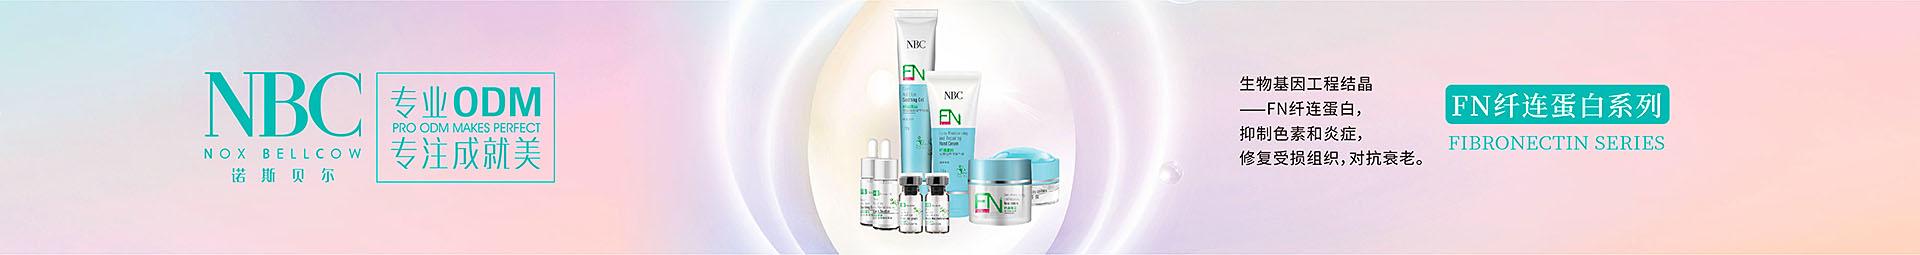 category-nox bellcow cosmetics-NOX BELLCOW-img-1